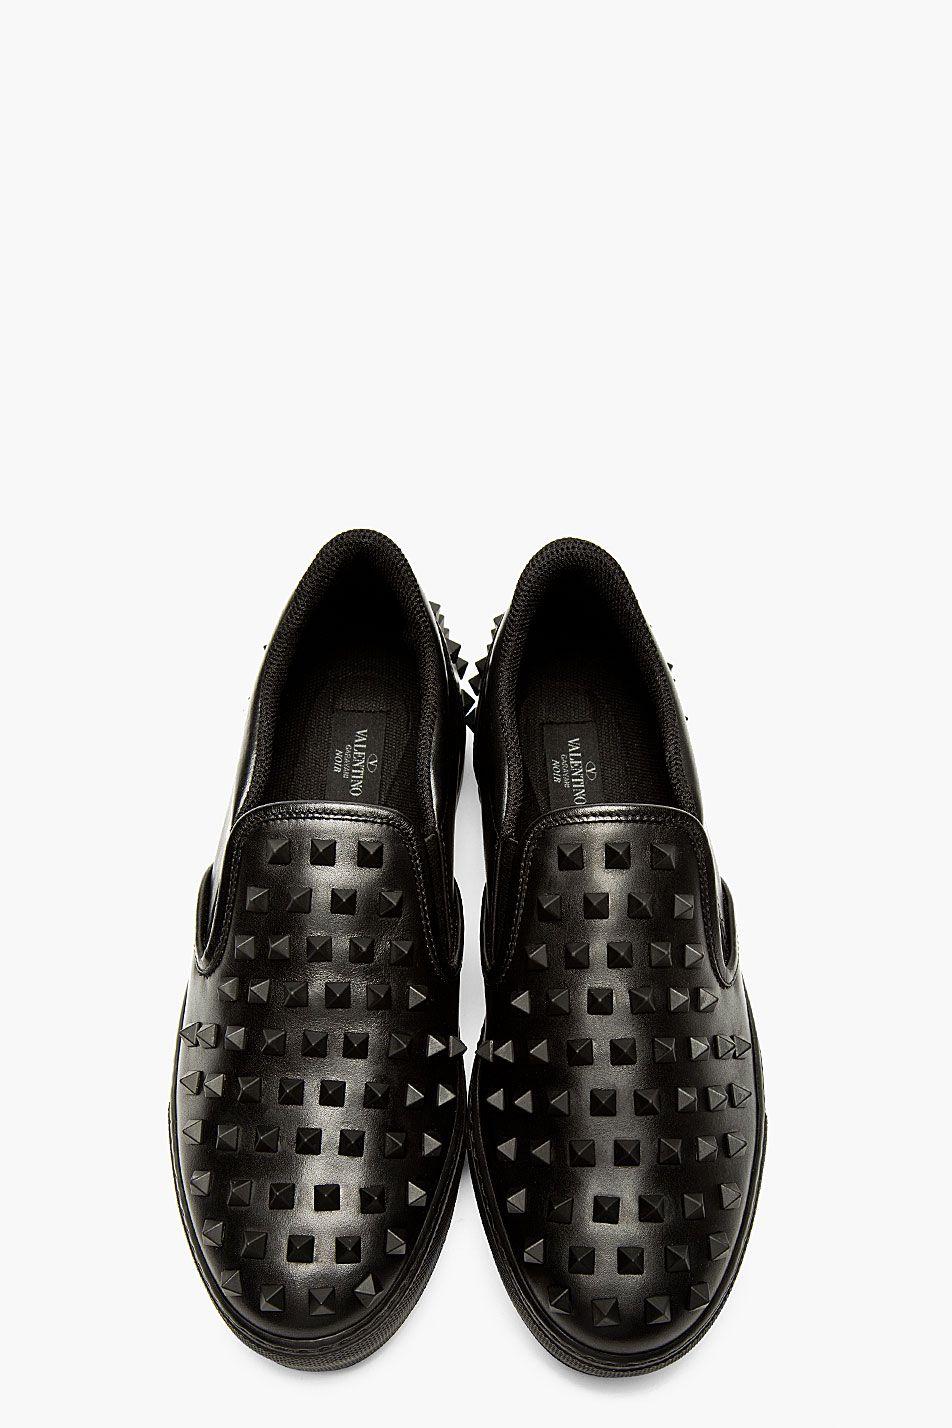 Valentino - Black Leather Studded Slip